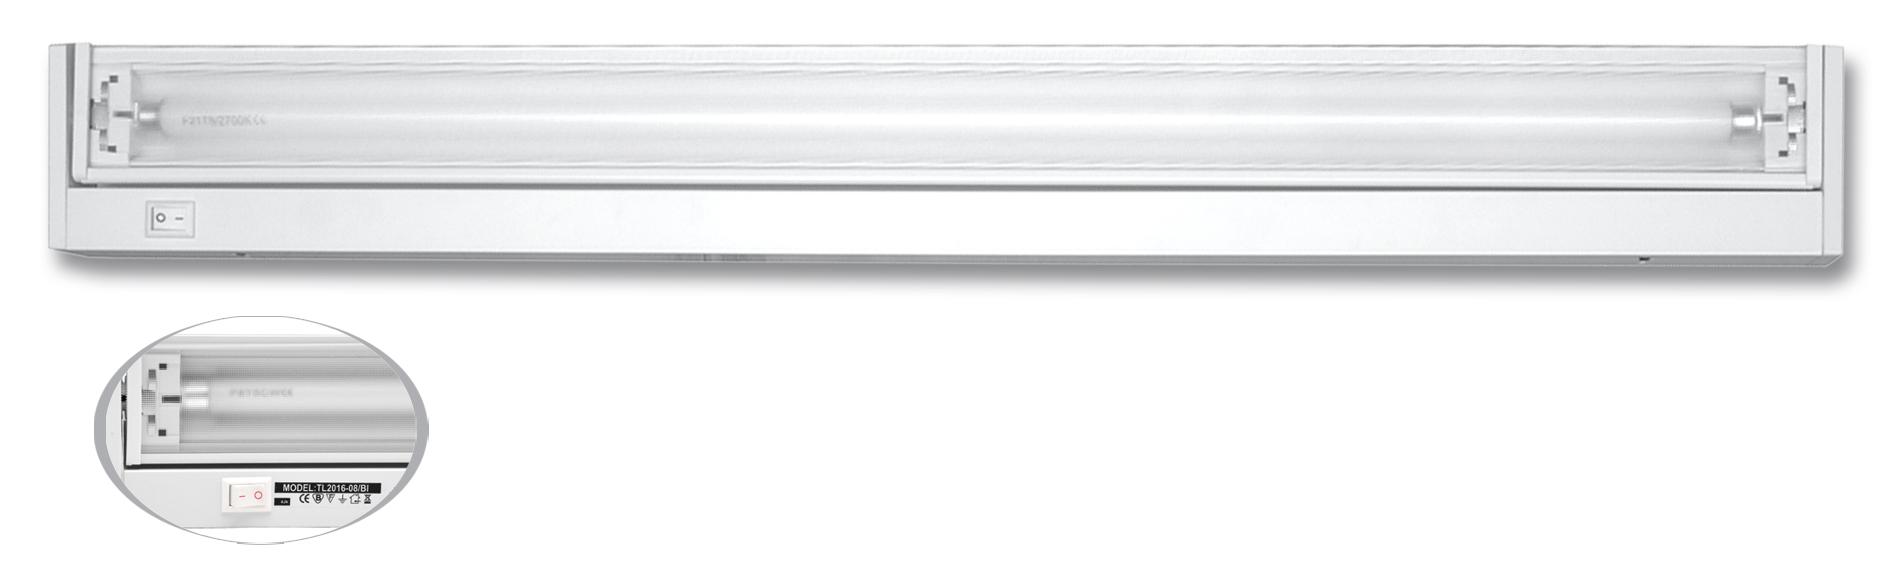 Ecolite TL2016-08/BI (Svietidlo žiarivkové 8W výklopné biele)